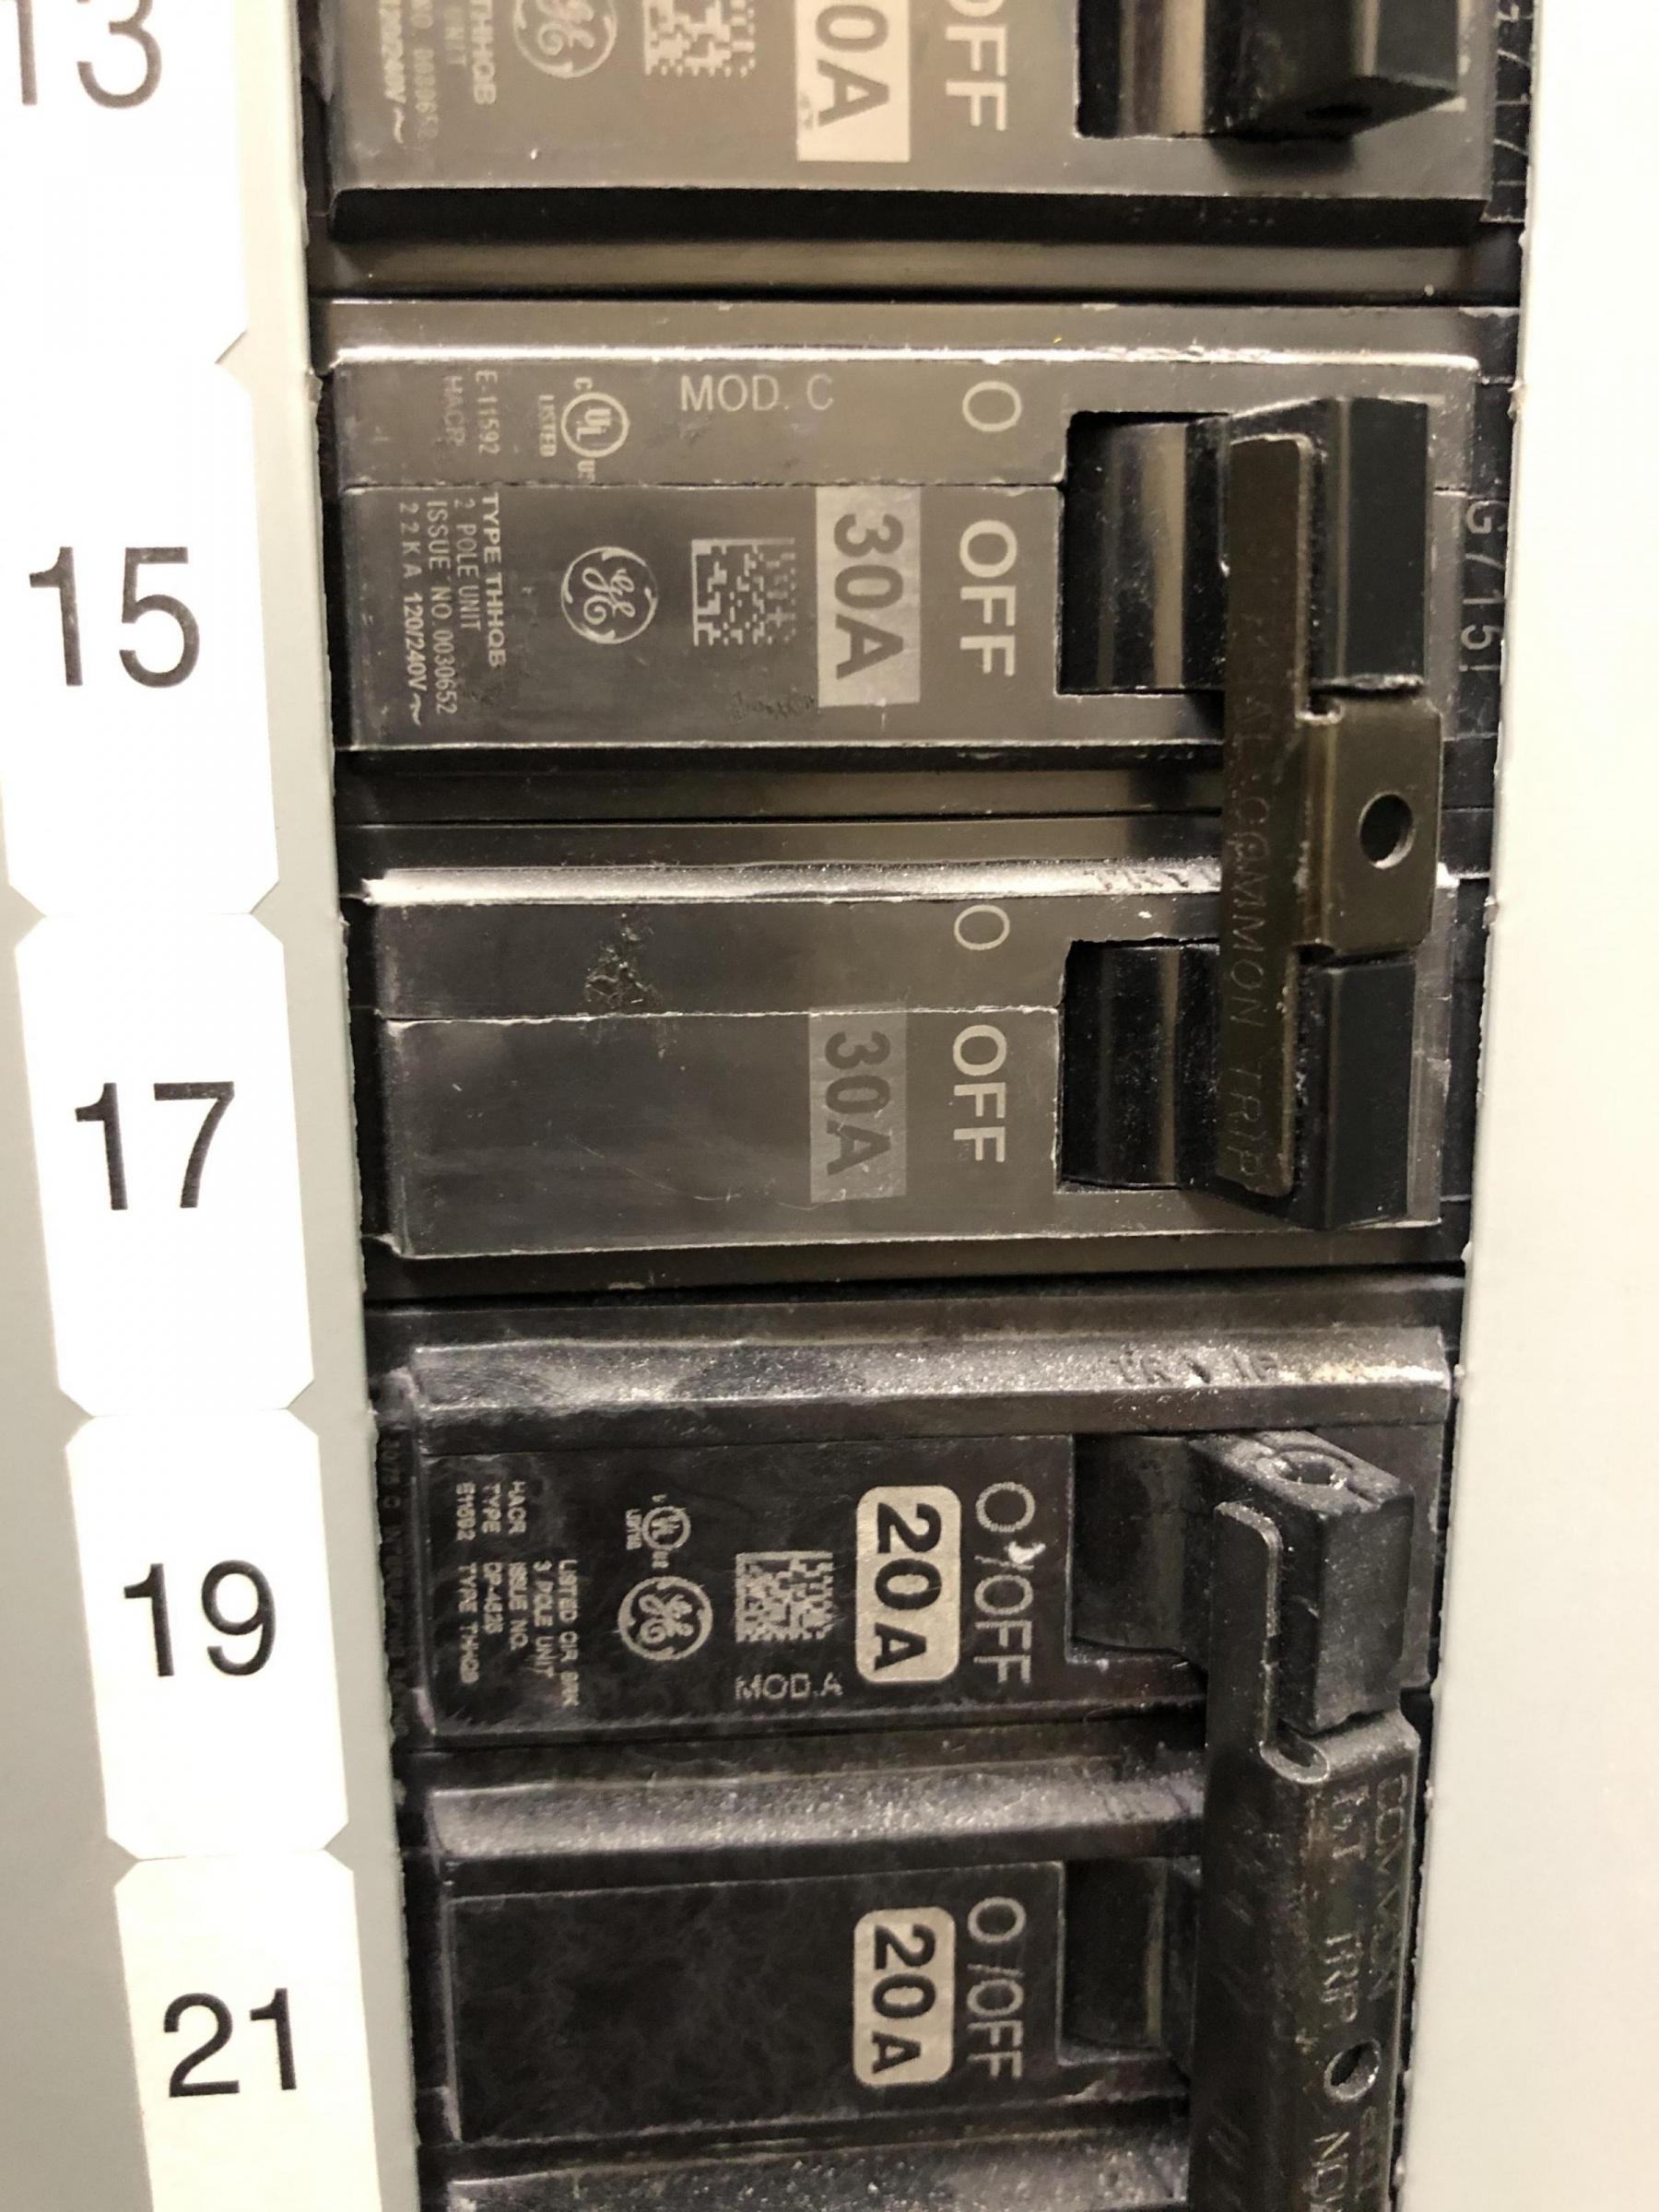 What breaker can be used to replace these?-b212c08e-b4ce-45fc-bf03-da5ae8cbf515_1571314795396.jpg